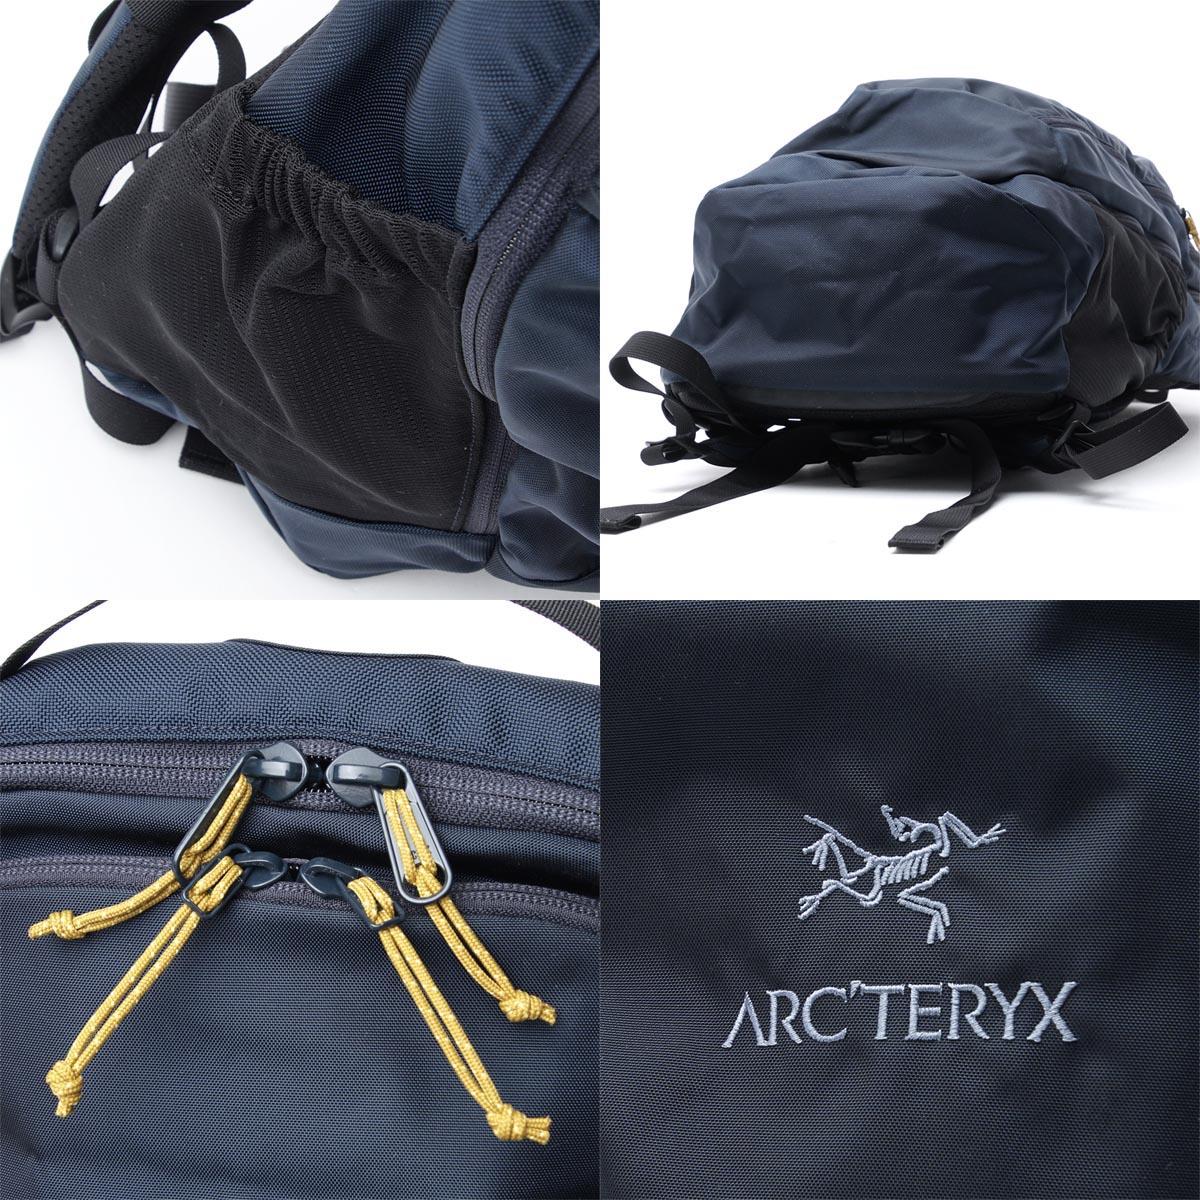 ARCTERYX アークテリクス バックパック/リュックサック/MANTIS 26L BACKPACK マンティス 26 バックパック